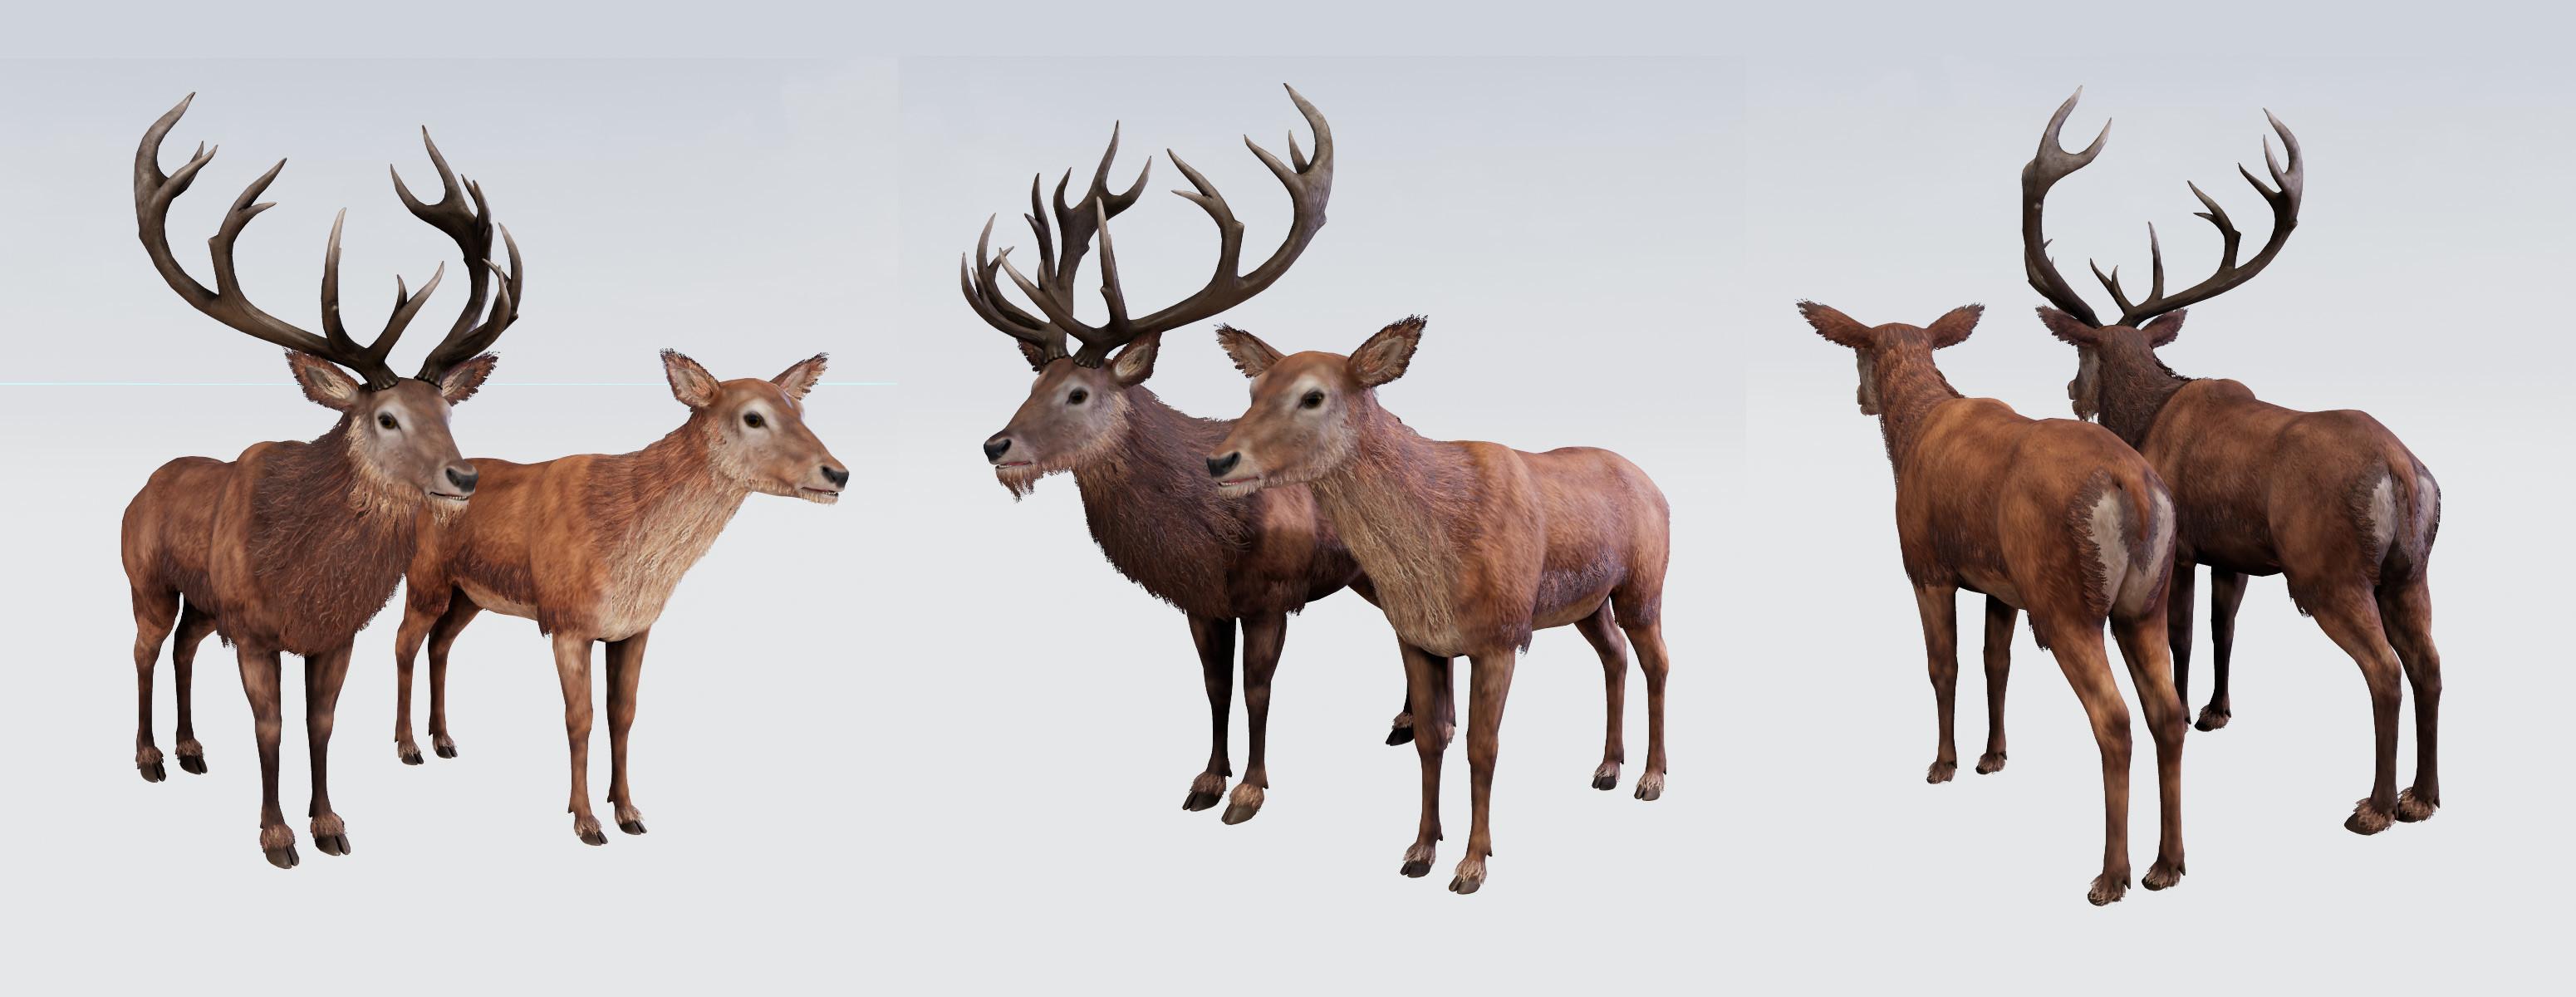 Rune Animals. Unreal engine shot.